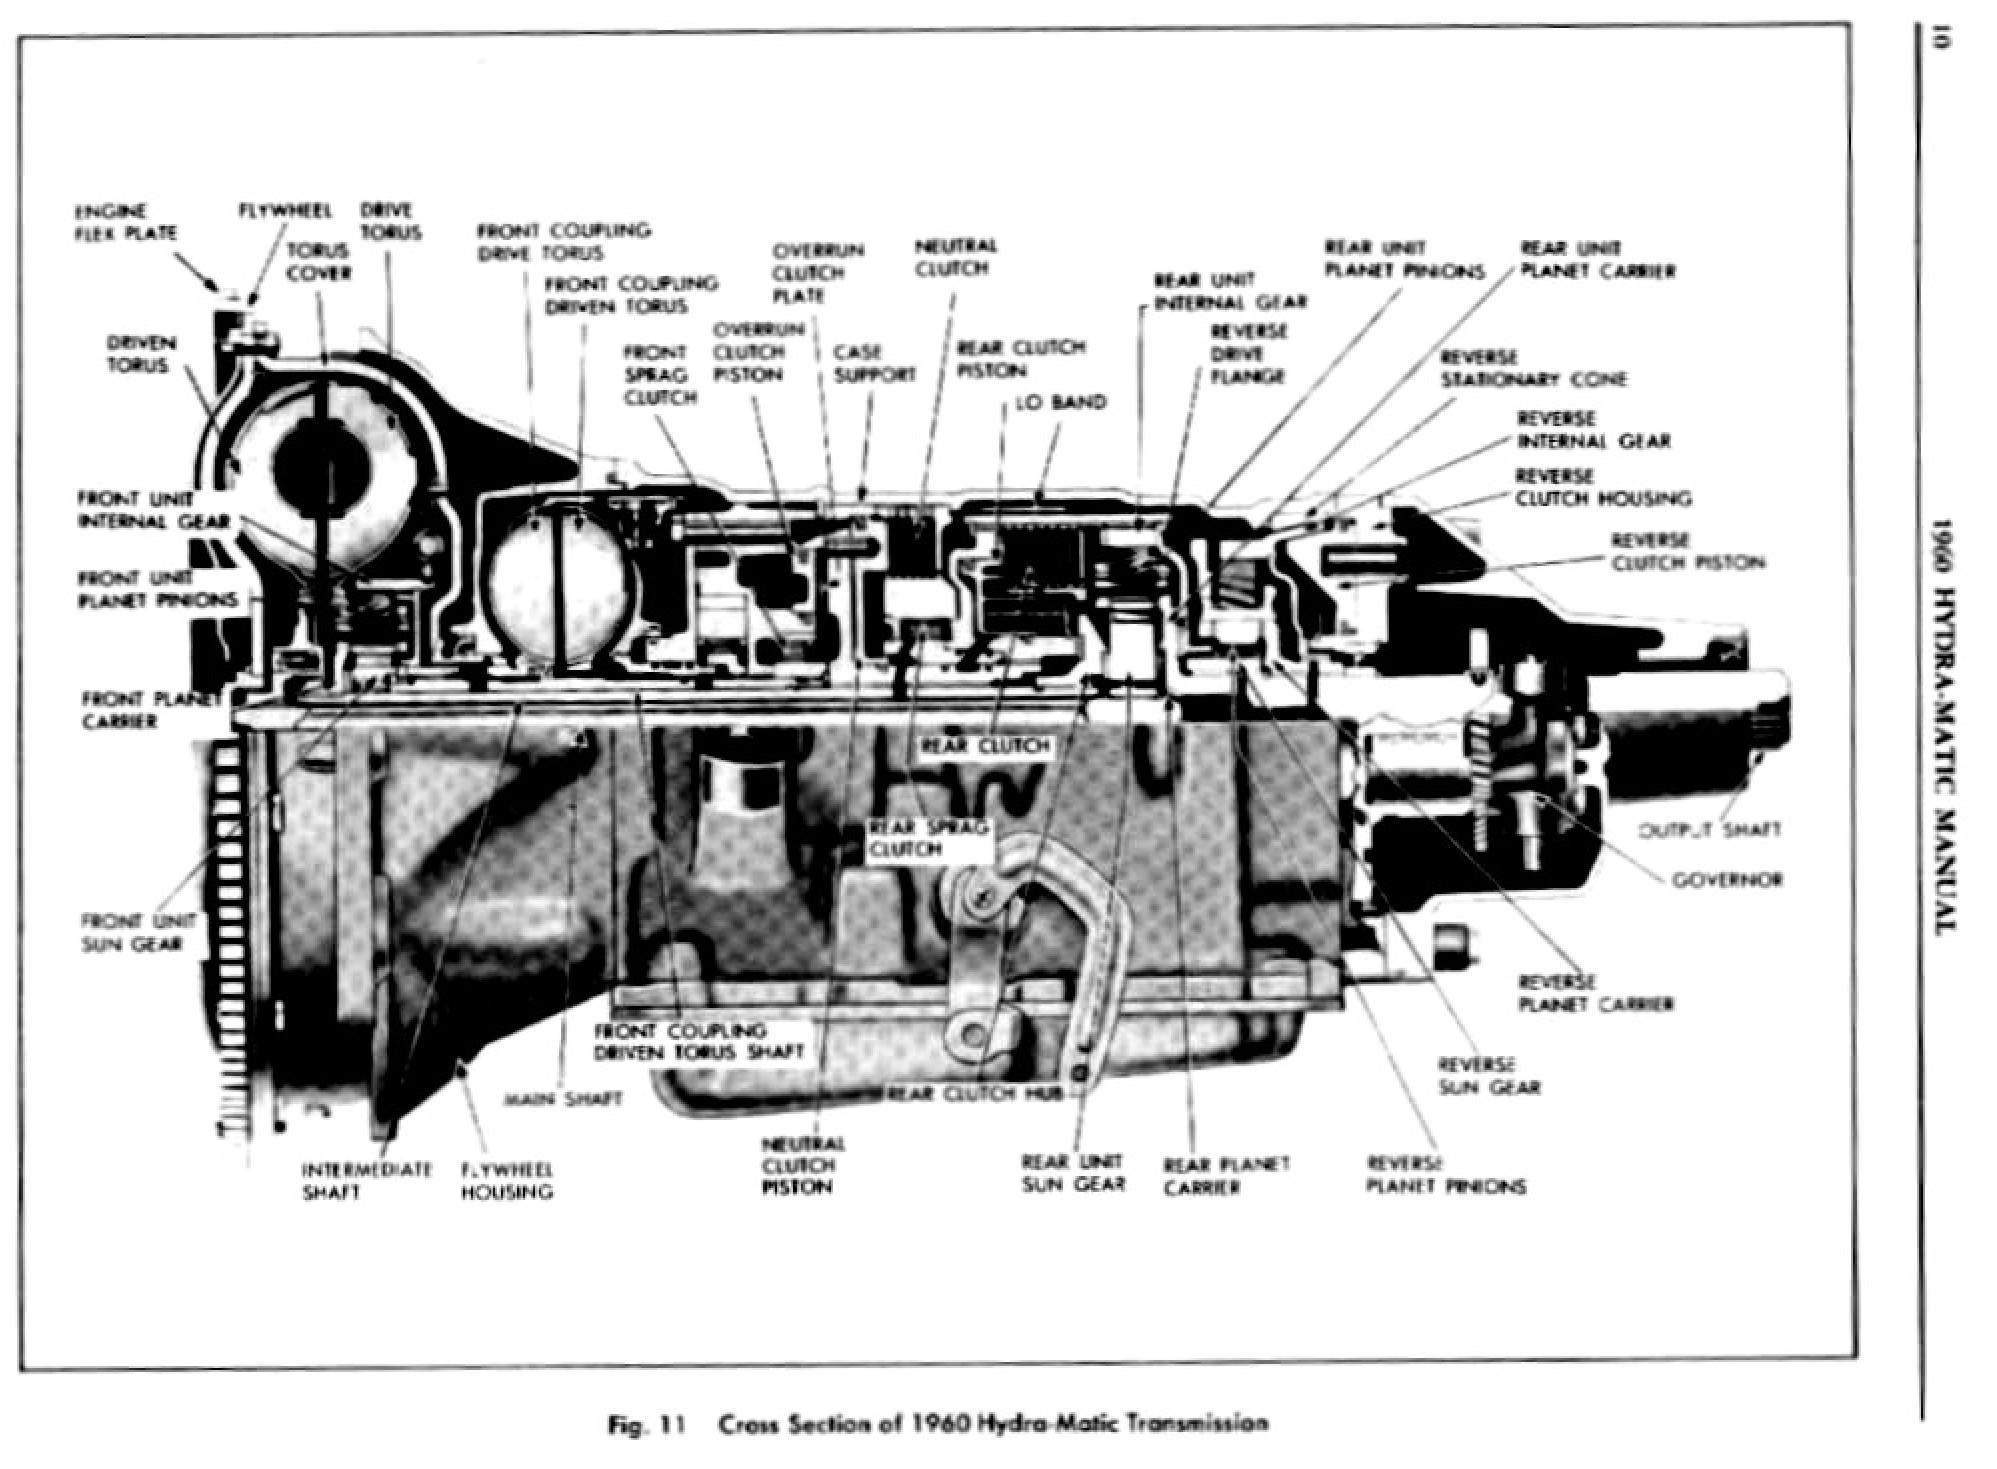 1960 Pontiac Shop Manual- Hydra-Matic Page 9 of 112